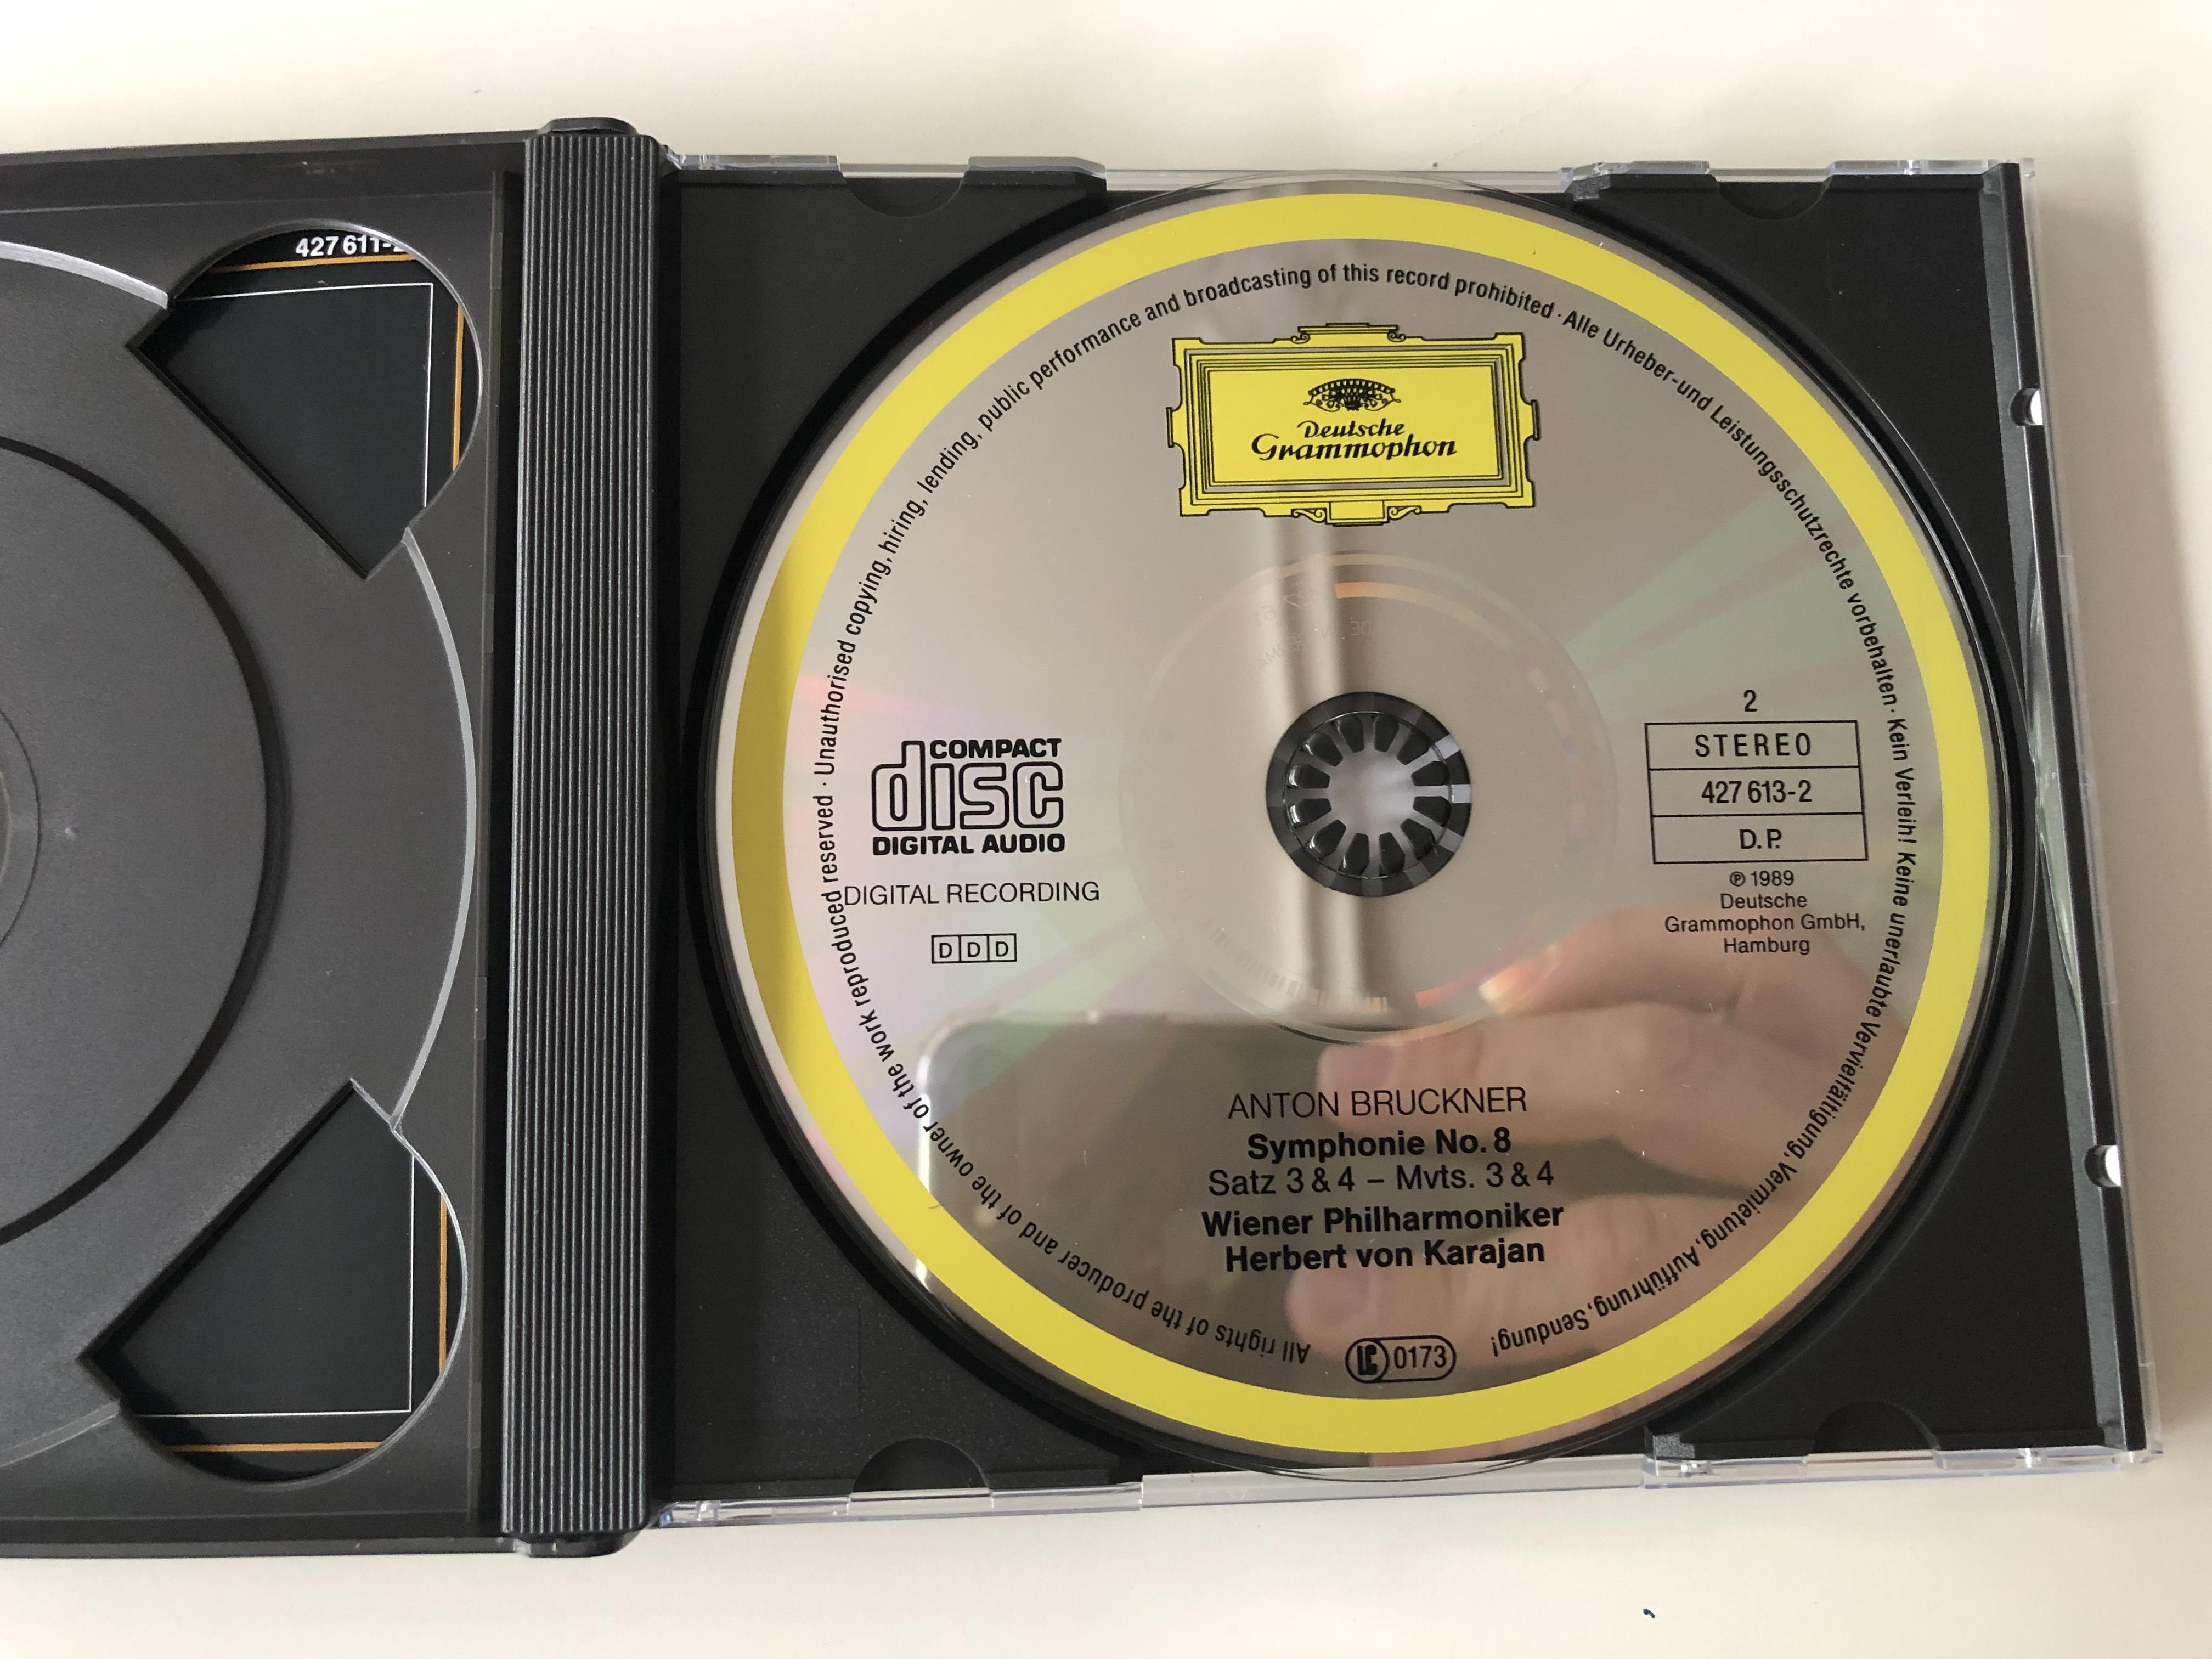 anton-bruckner-symphonie-no.-8-wiener-philharmoniker-herbert-von-karajan-deutsche-grammophon-2x-audio-cd-1989-stereo-427-611-2-9-.jpg